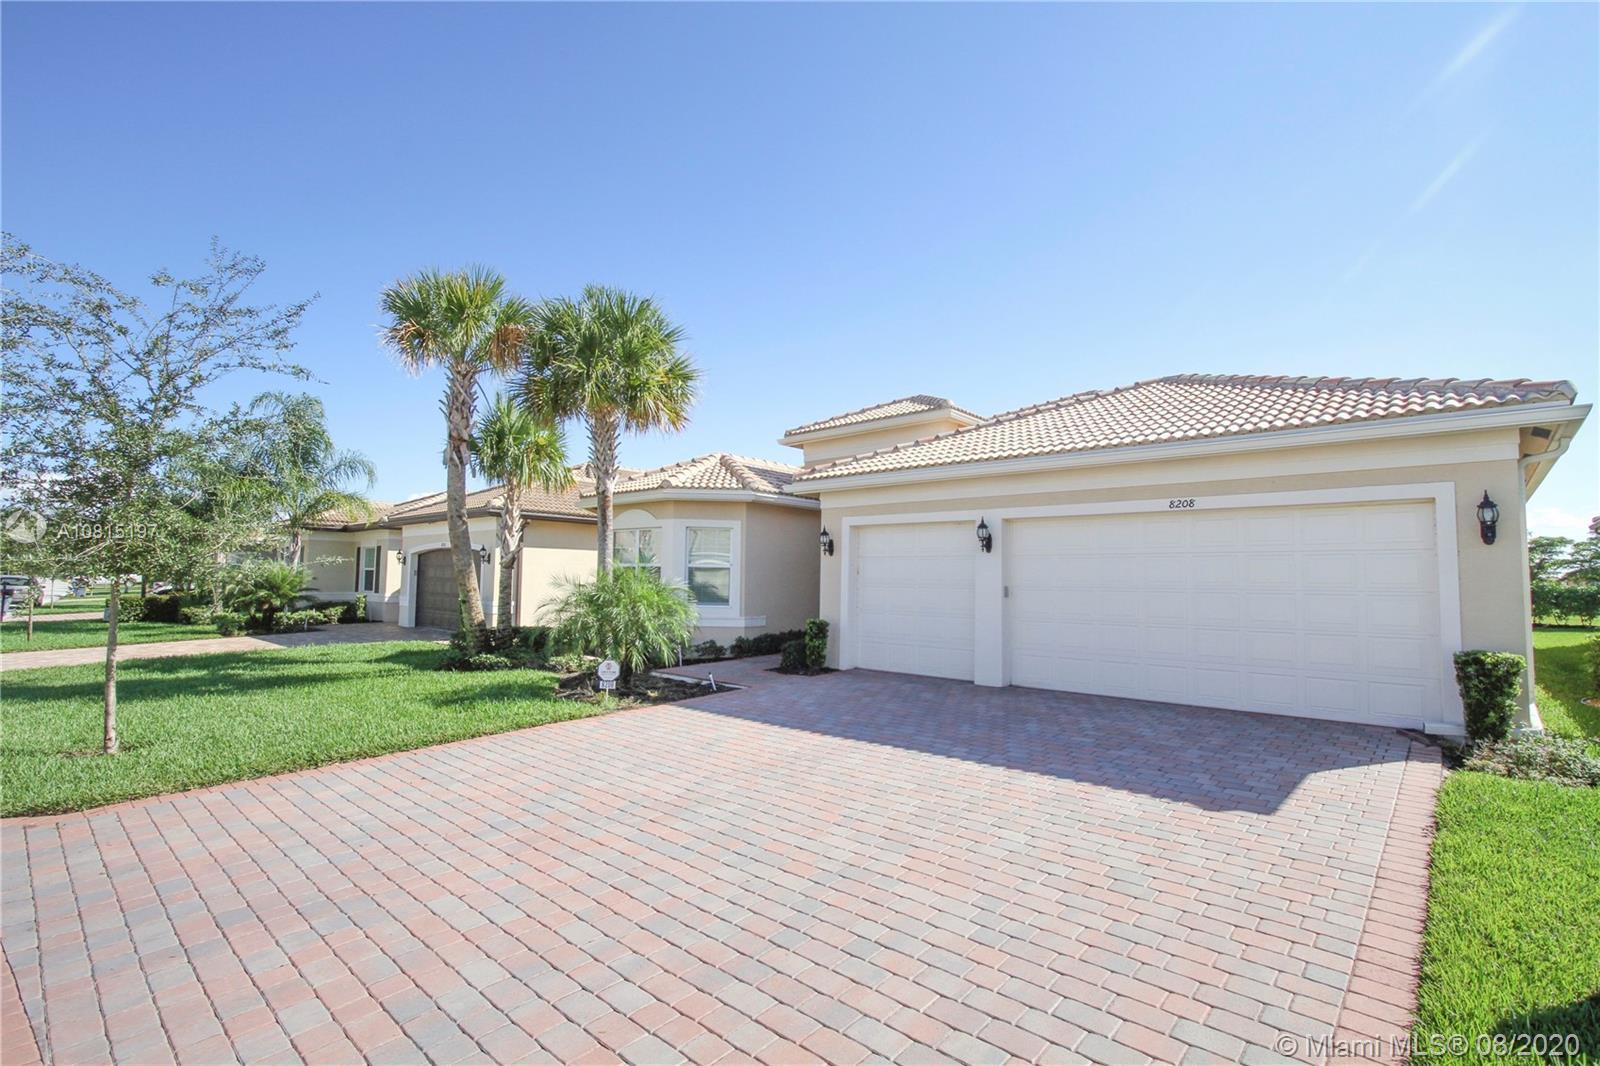 8208 Alpine Ridge Rd Property Photo - Boynton Beach, FL real estate listing